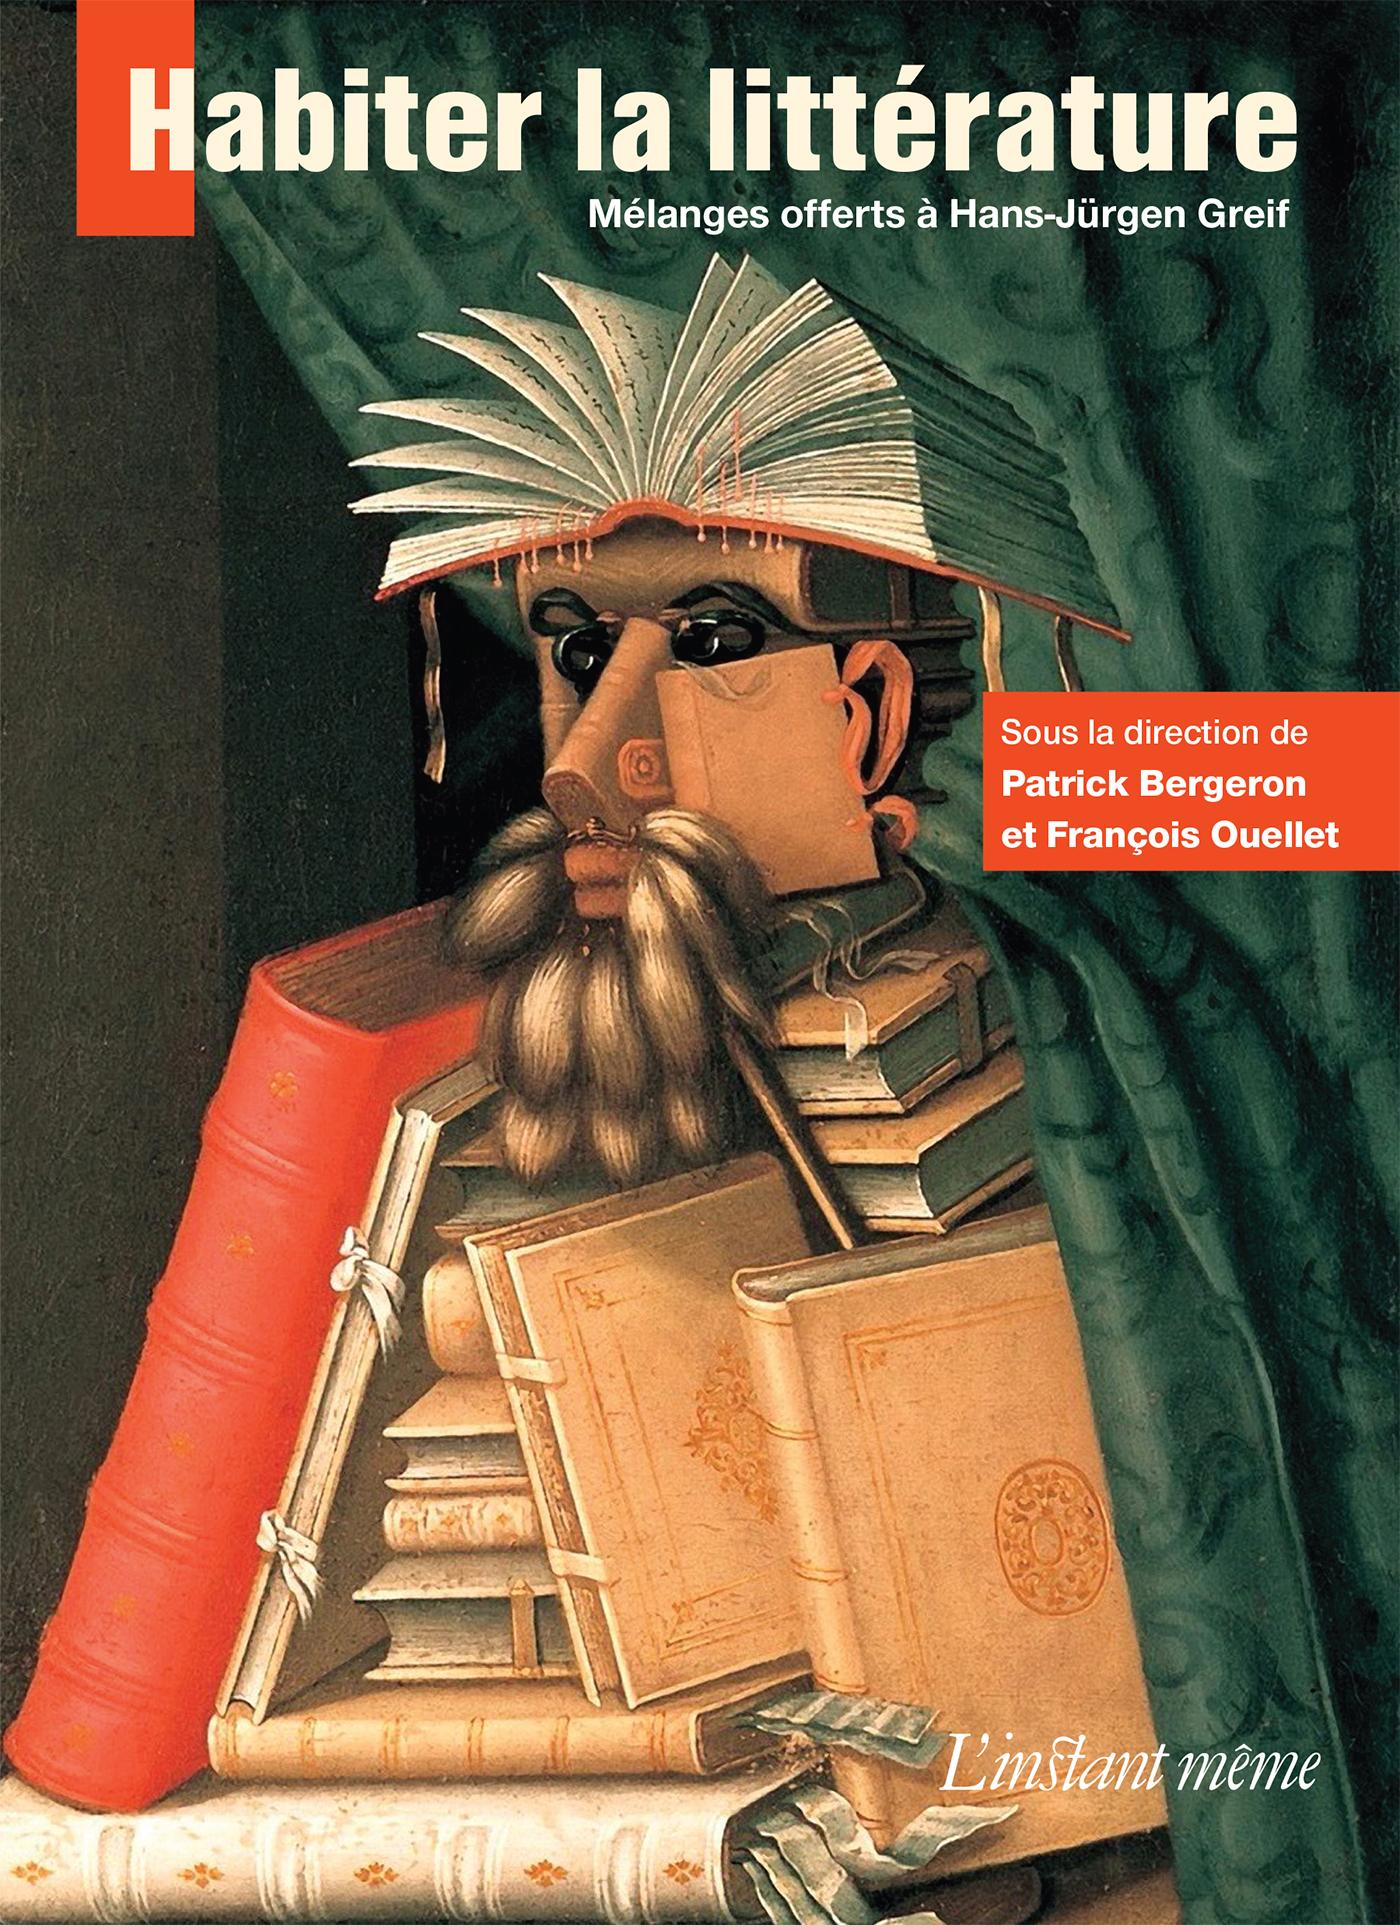 Habiter la littérature